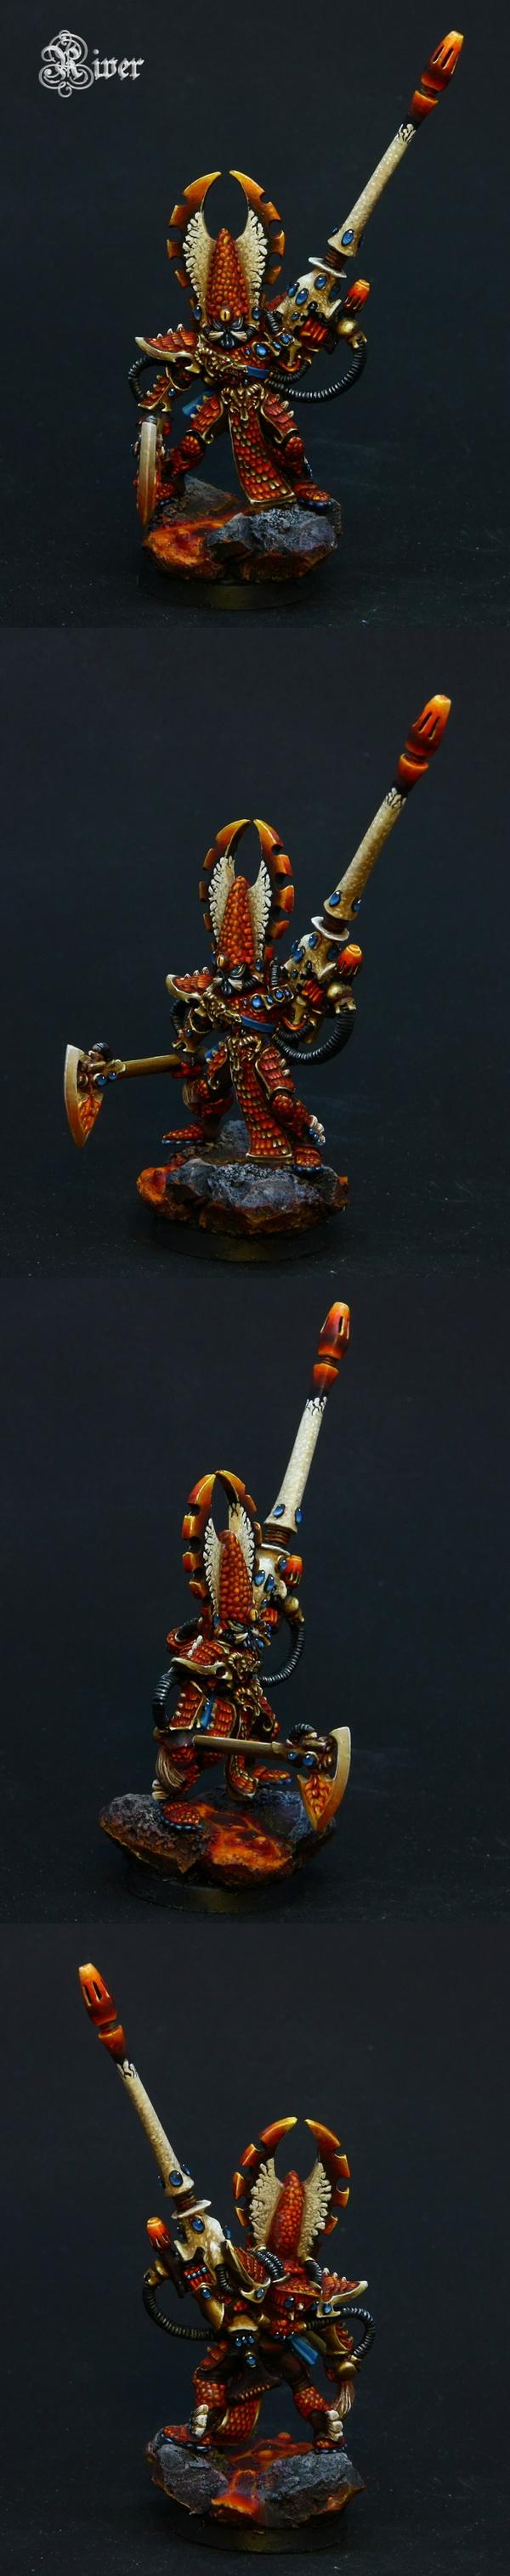 Fuegan, The Phoenix lord